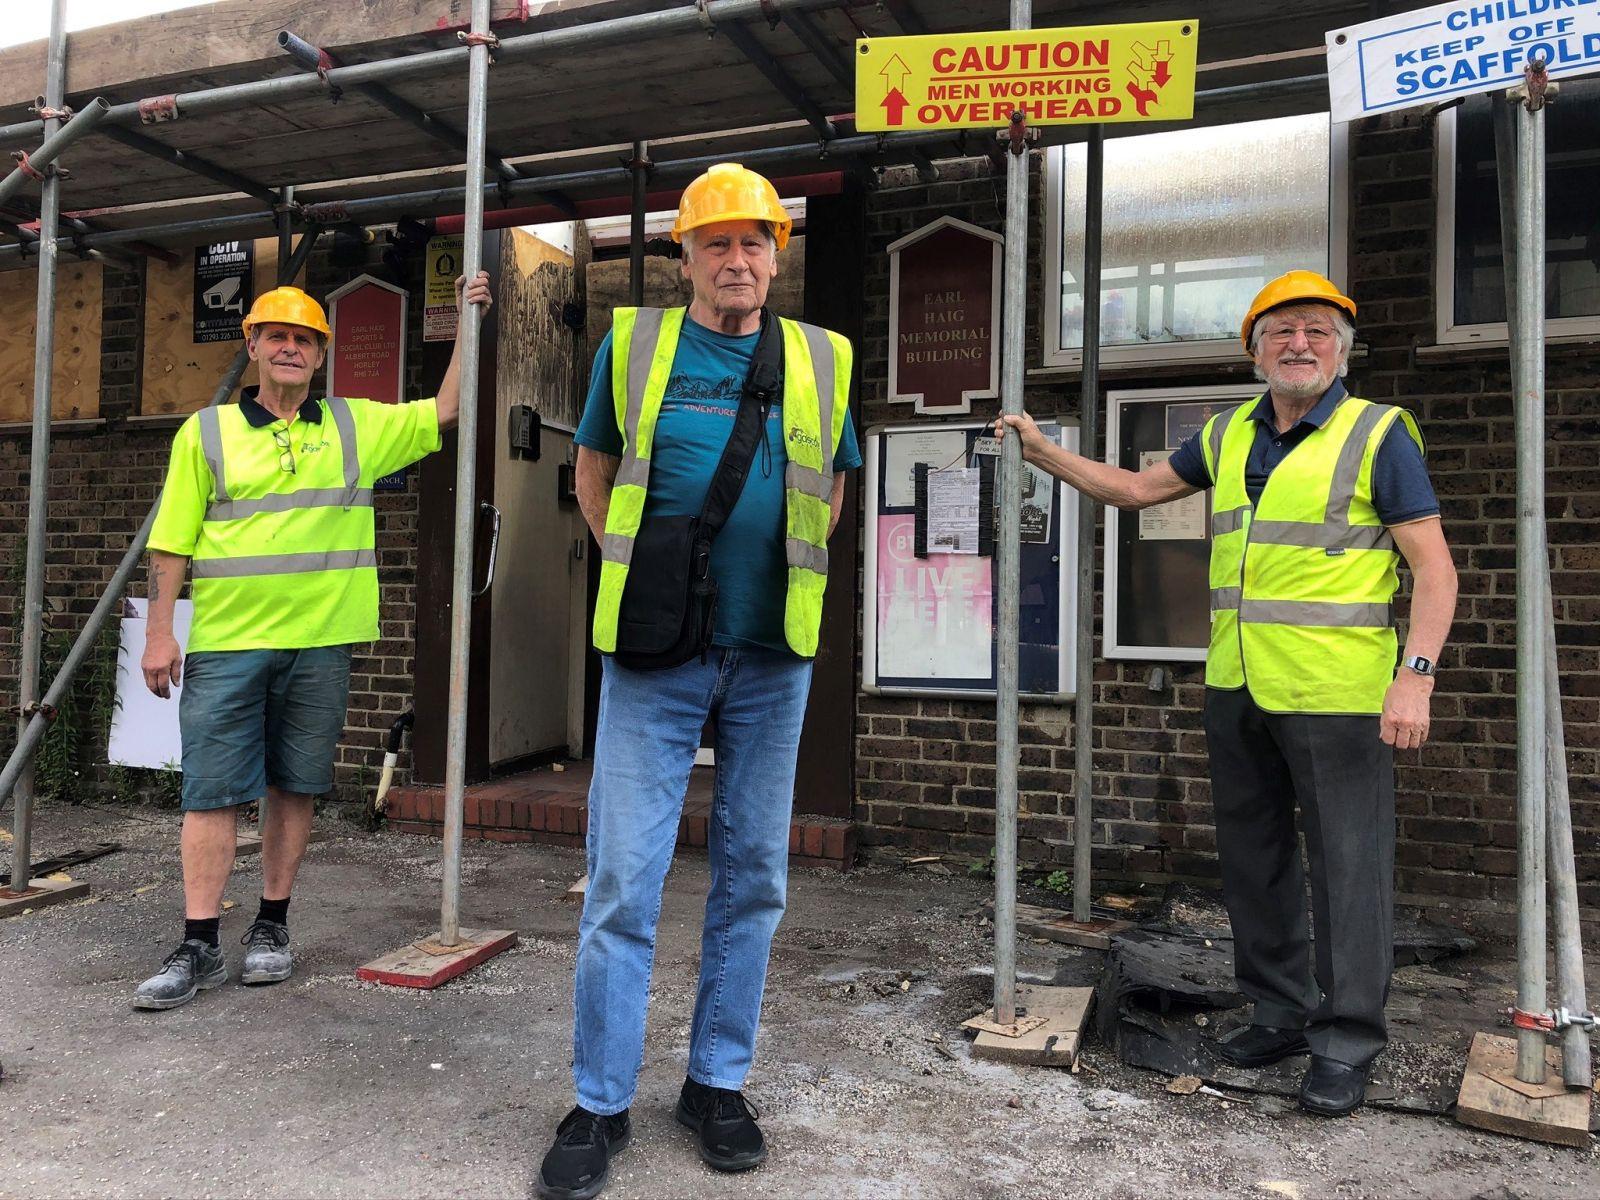 A photo of Cllr David Powell, alongside Tony Keay and Kevin Devlin, outside the damaged hall.